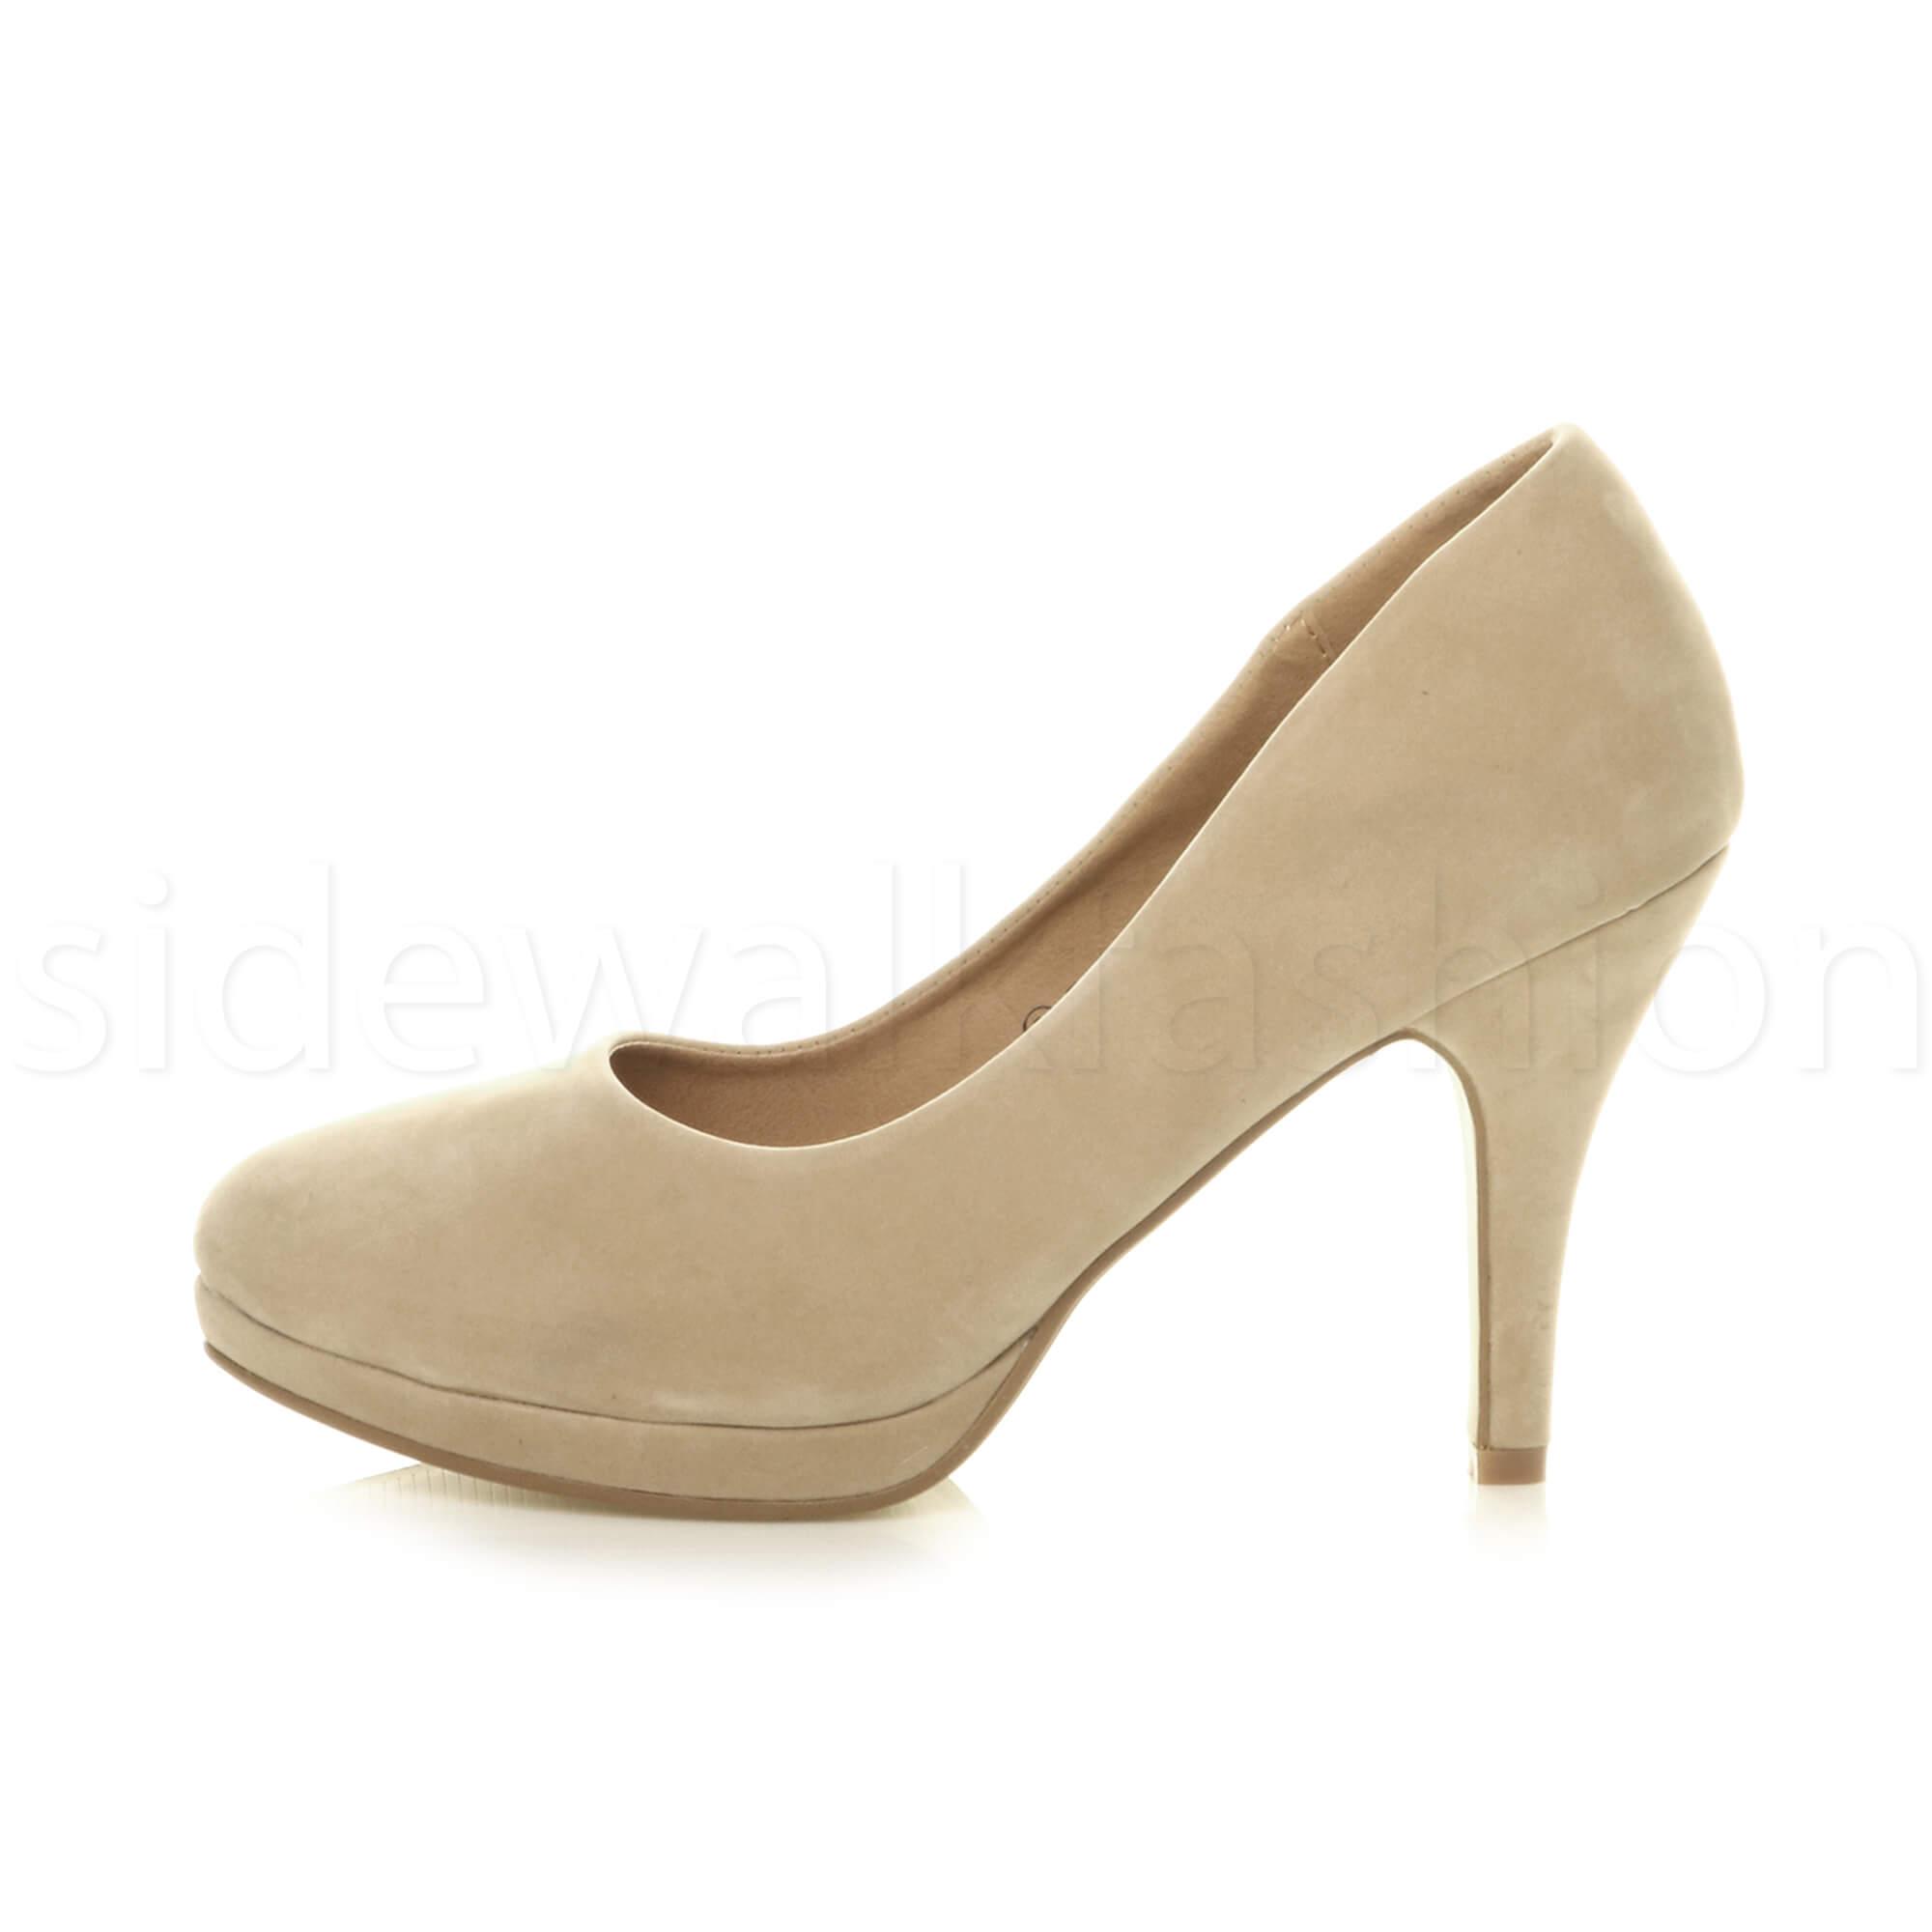 Womens-ladies-high-mid-heel-platform-wedding-evening-bridesmaid-court-shoes-size thumbnail 129